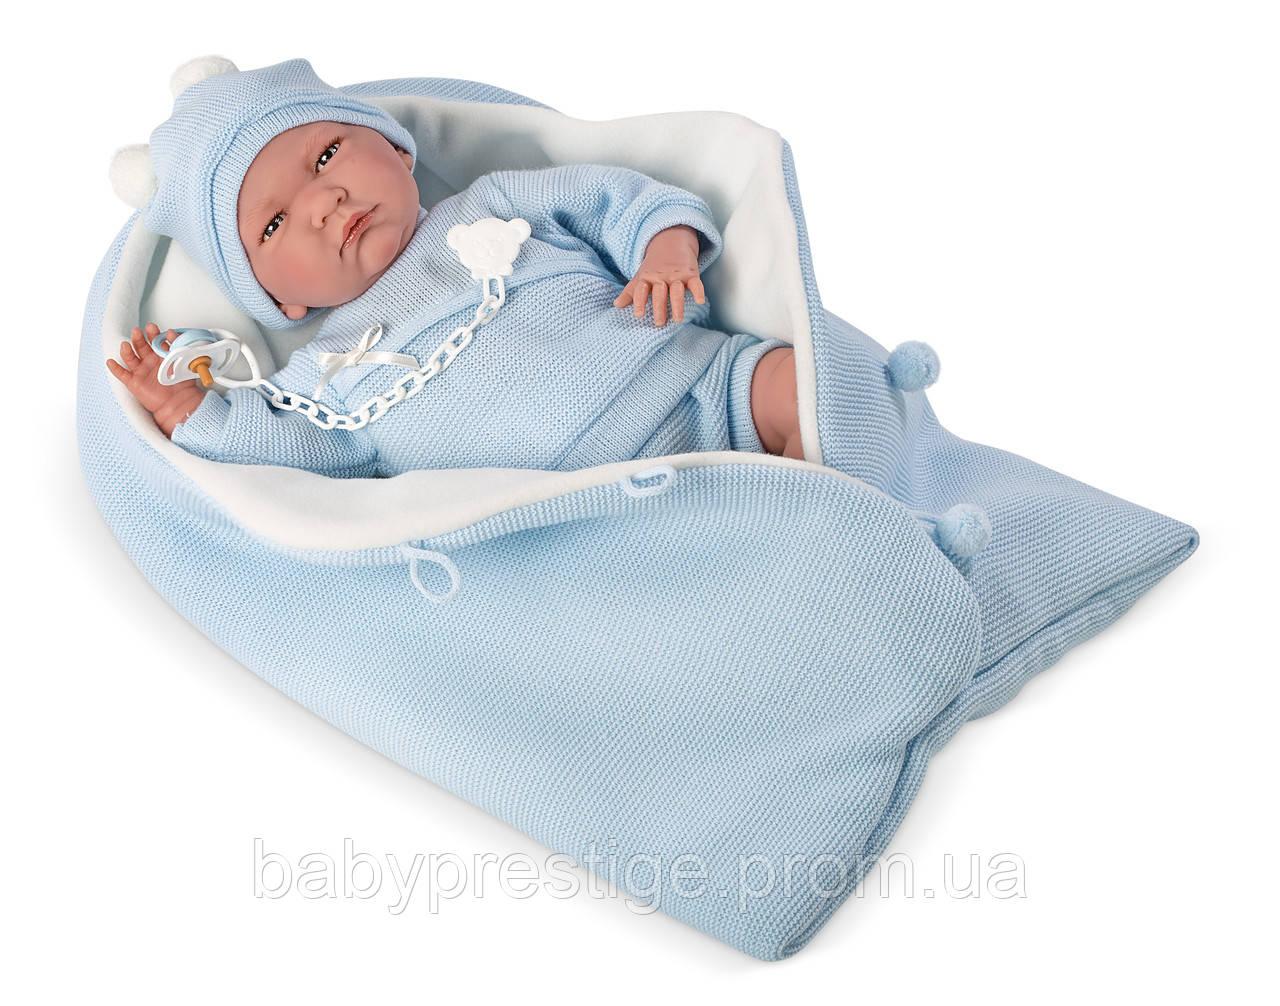 Llorens - кукла младенец мальчик Lalo, 40 см